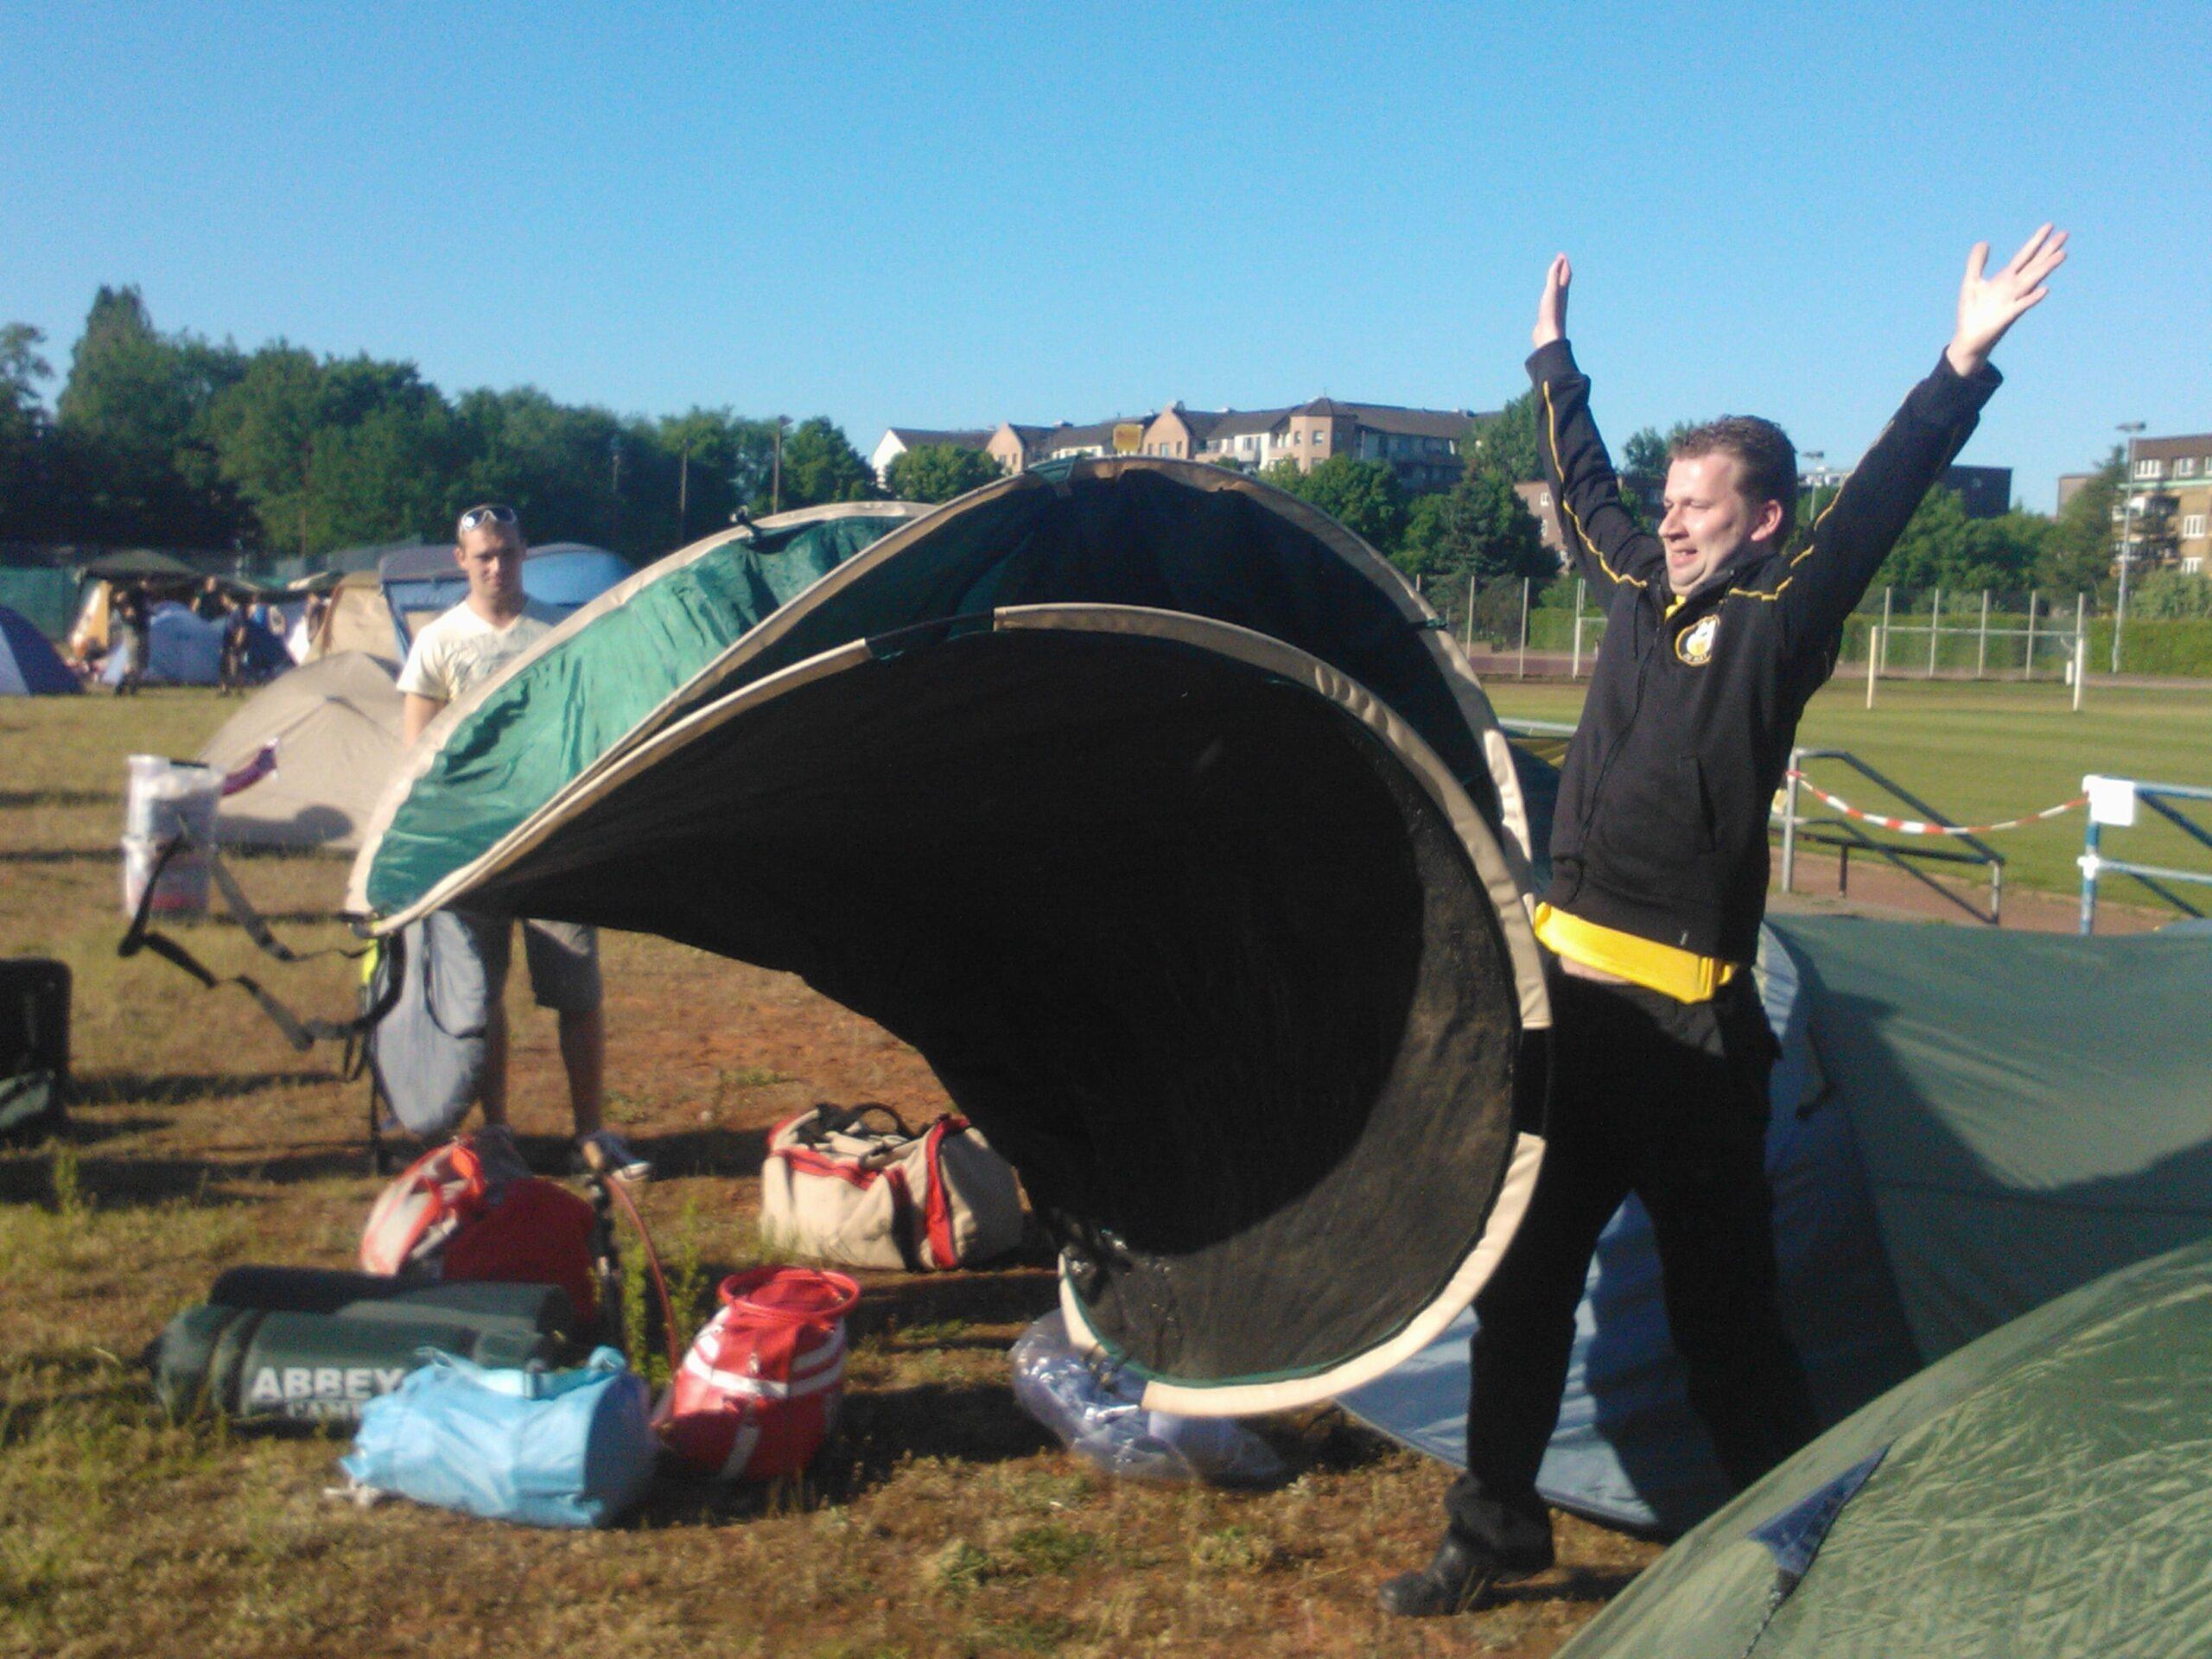 Campinglife op supporterstoernooi in Hamburg (2012)